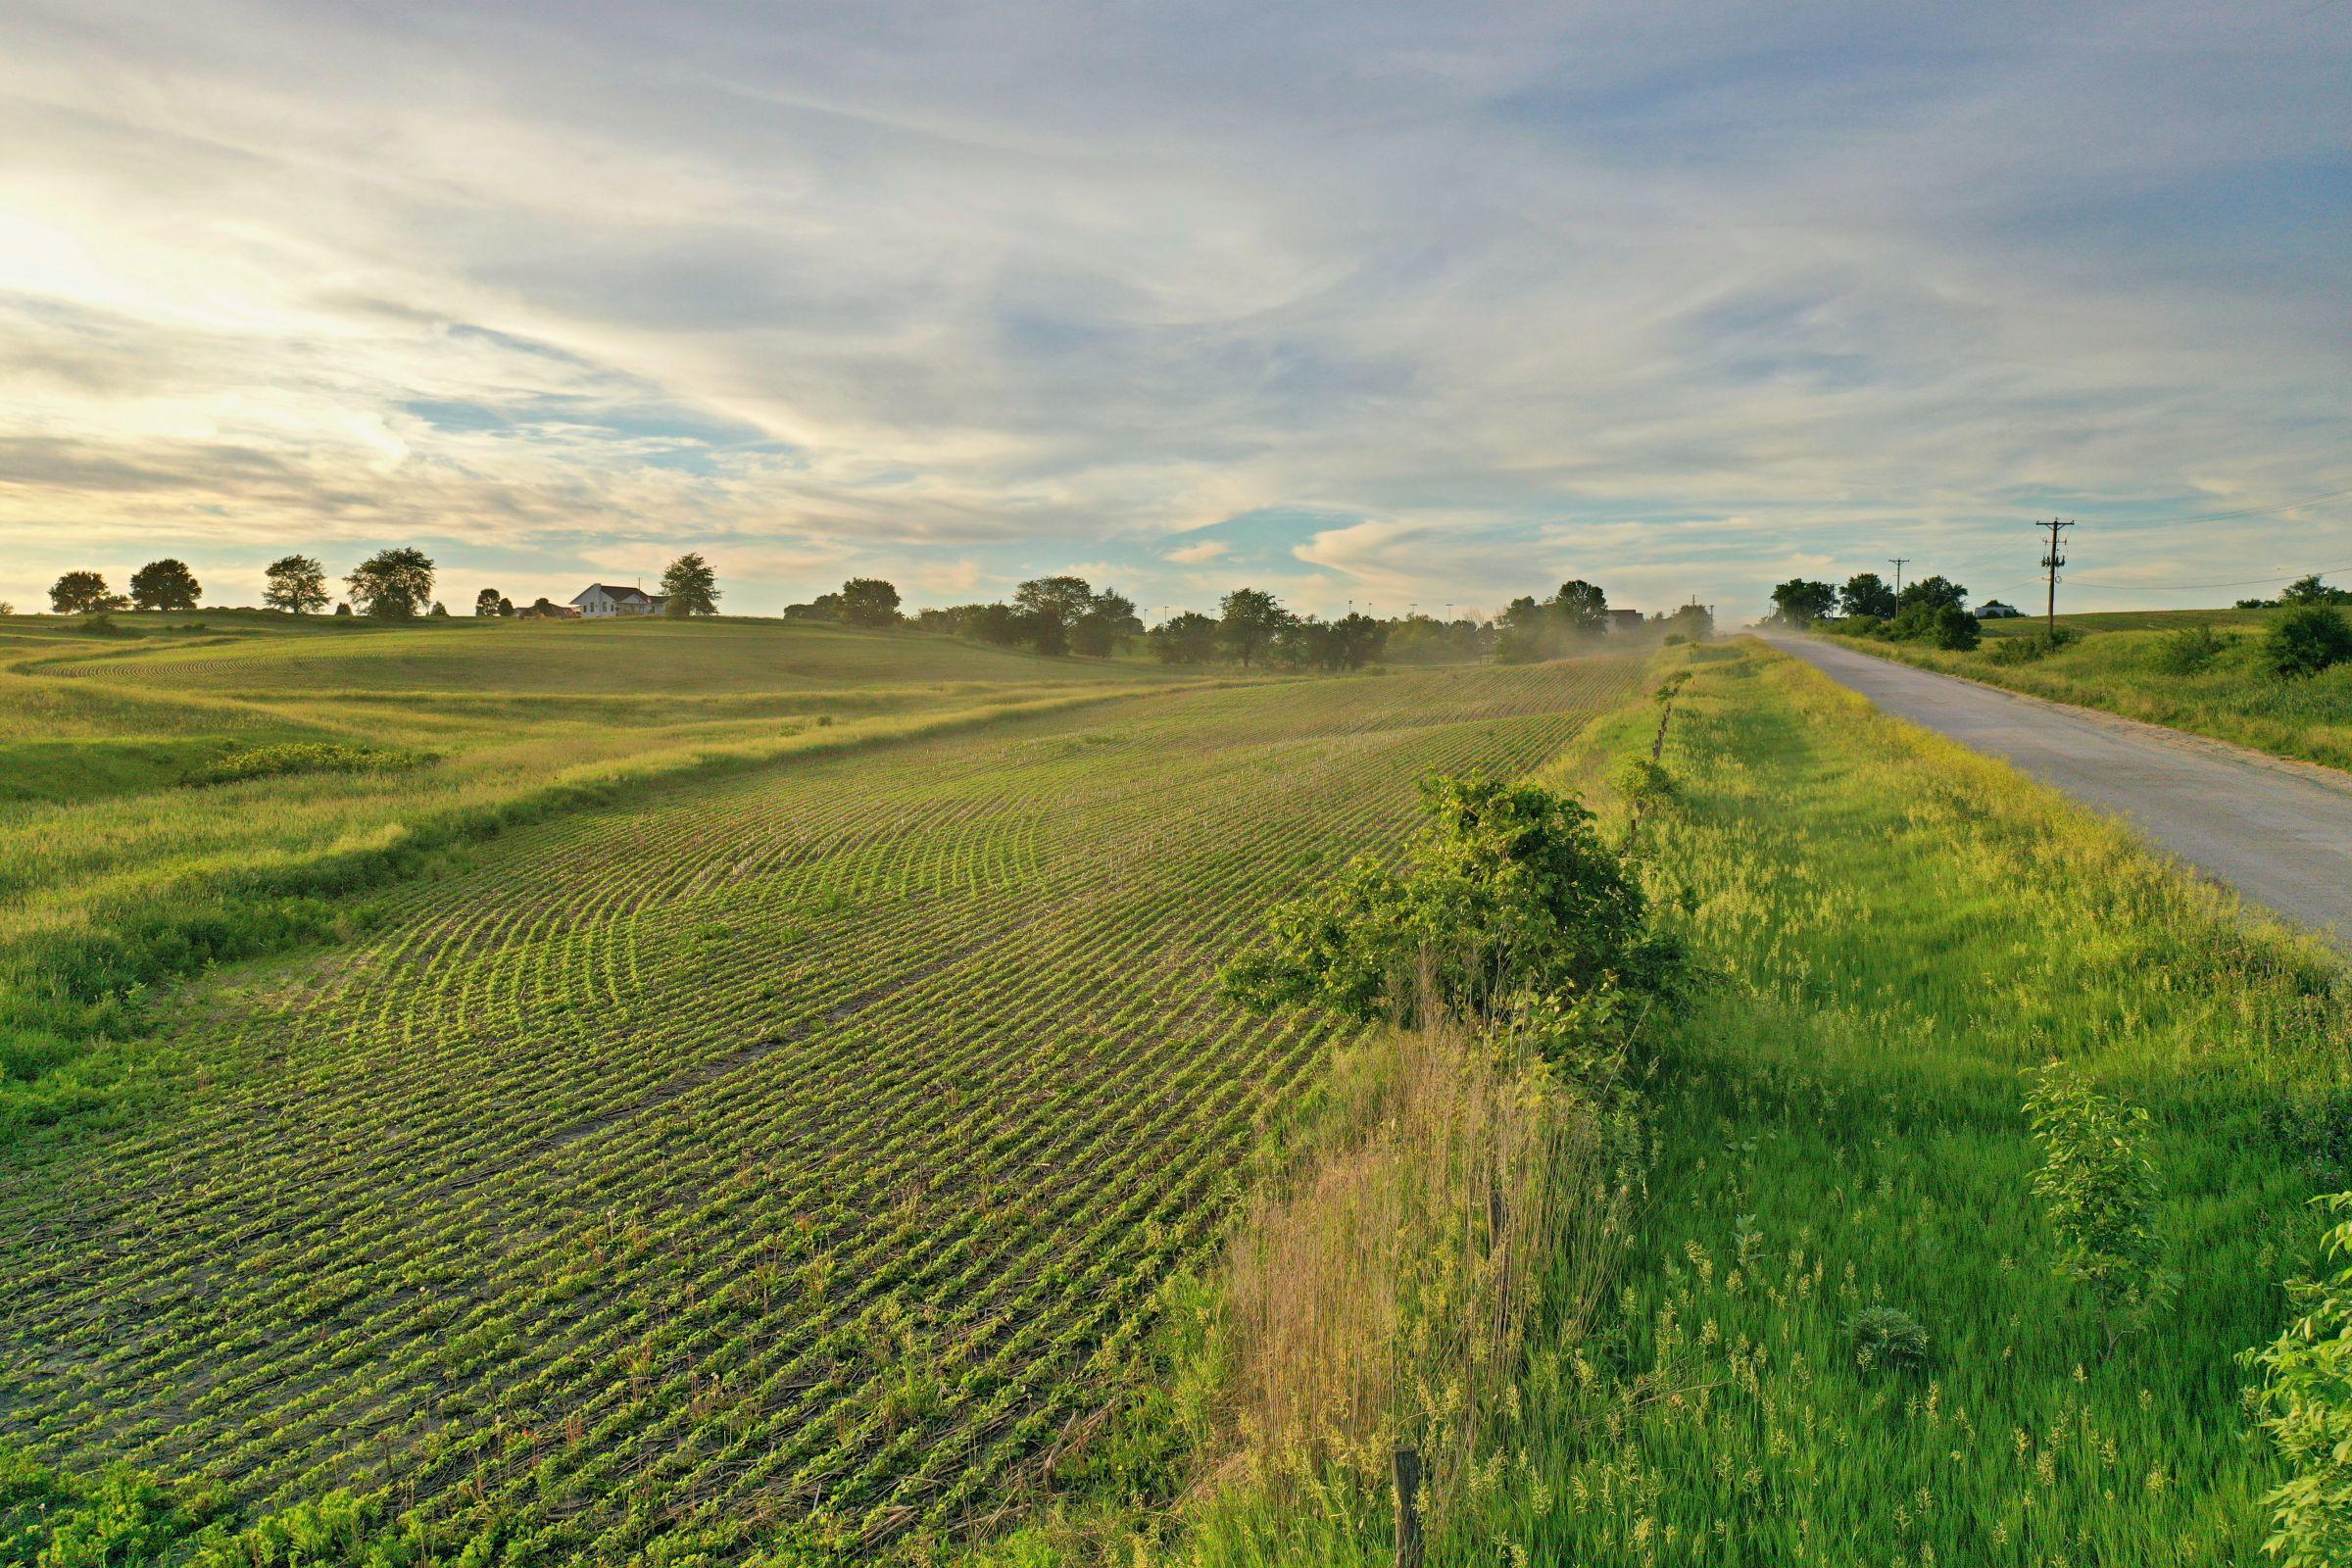 land-warren-county-iowa-20-acres-listing-number-15425-0-2021-03-25-193603.JPG